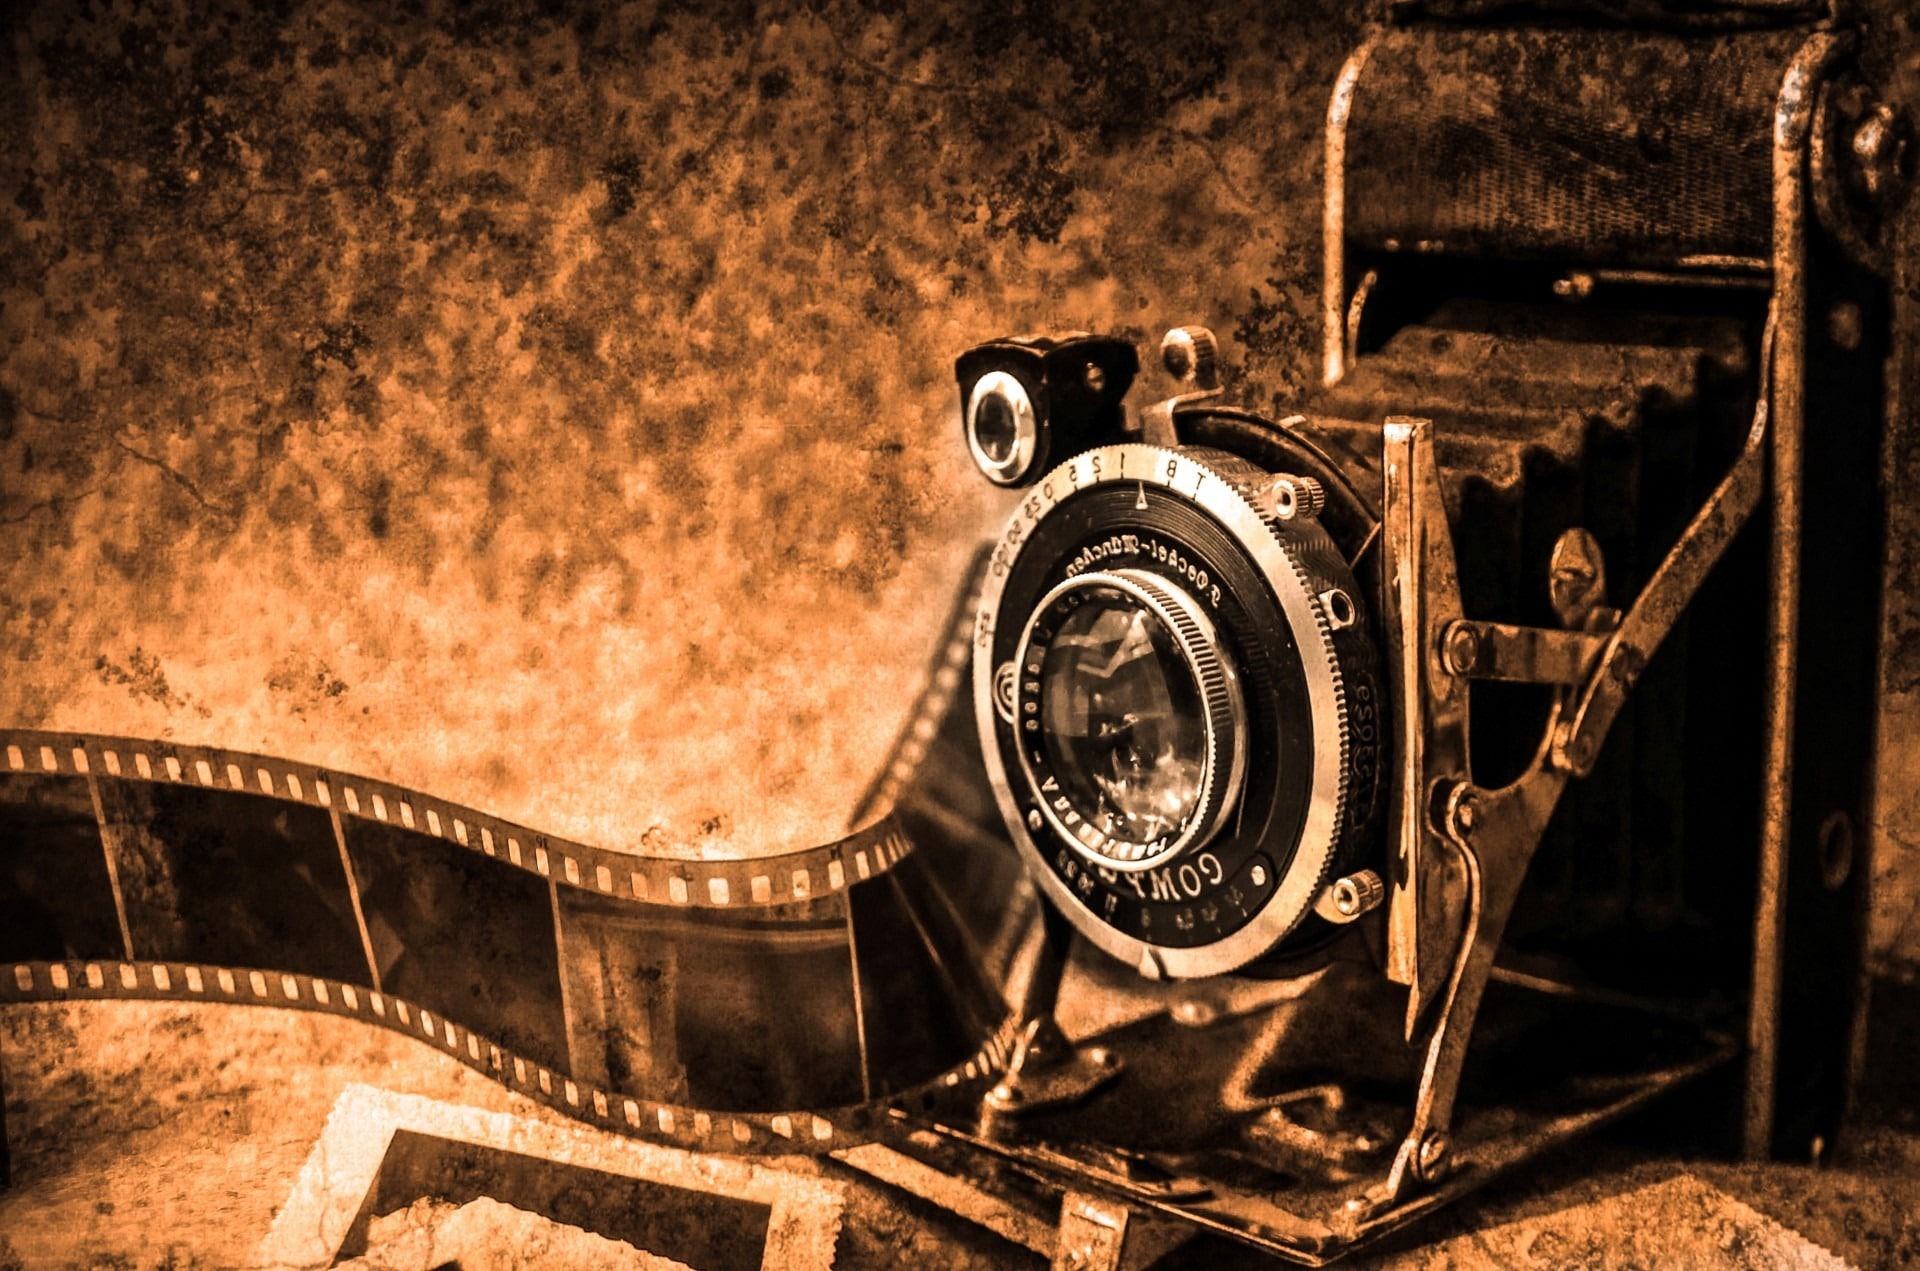 Un appareil photo de rêve